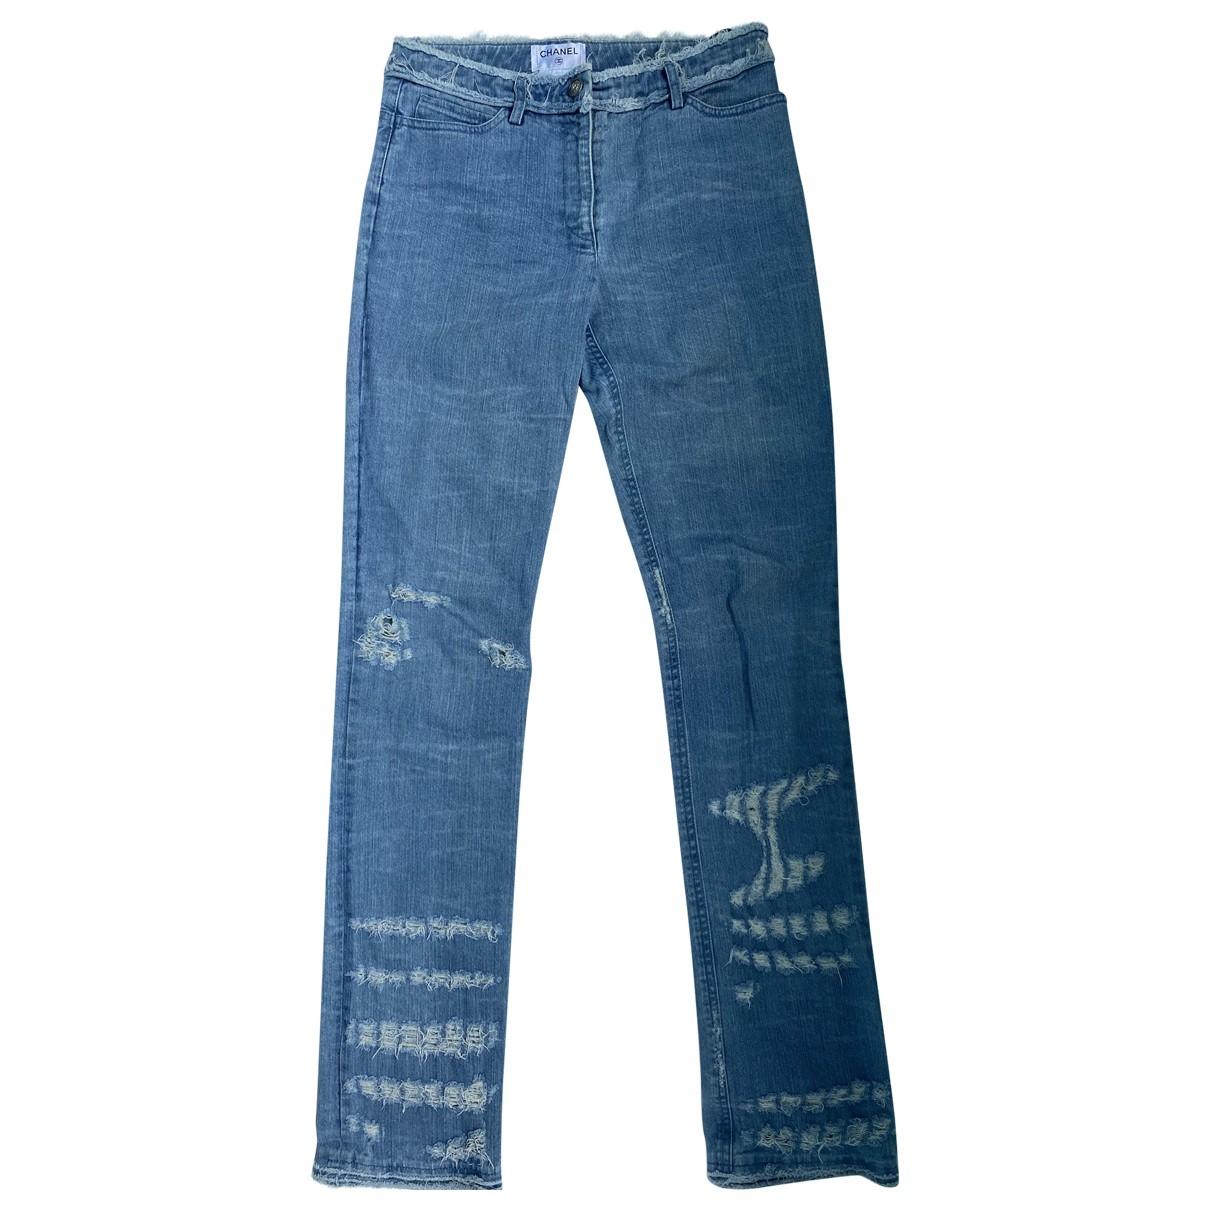 Chanel \N Blue Denim - Jeans Jeans for Women 38 FR